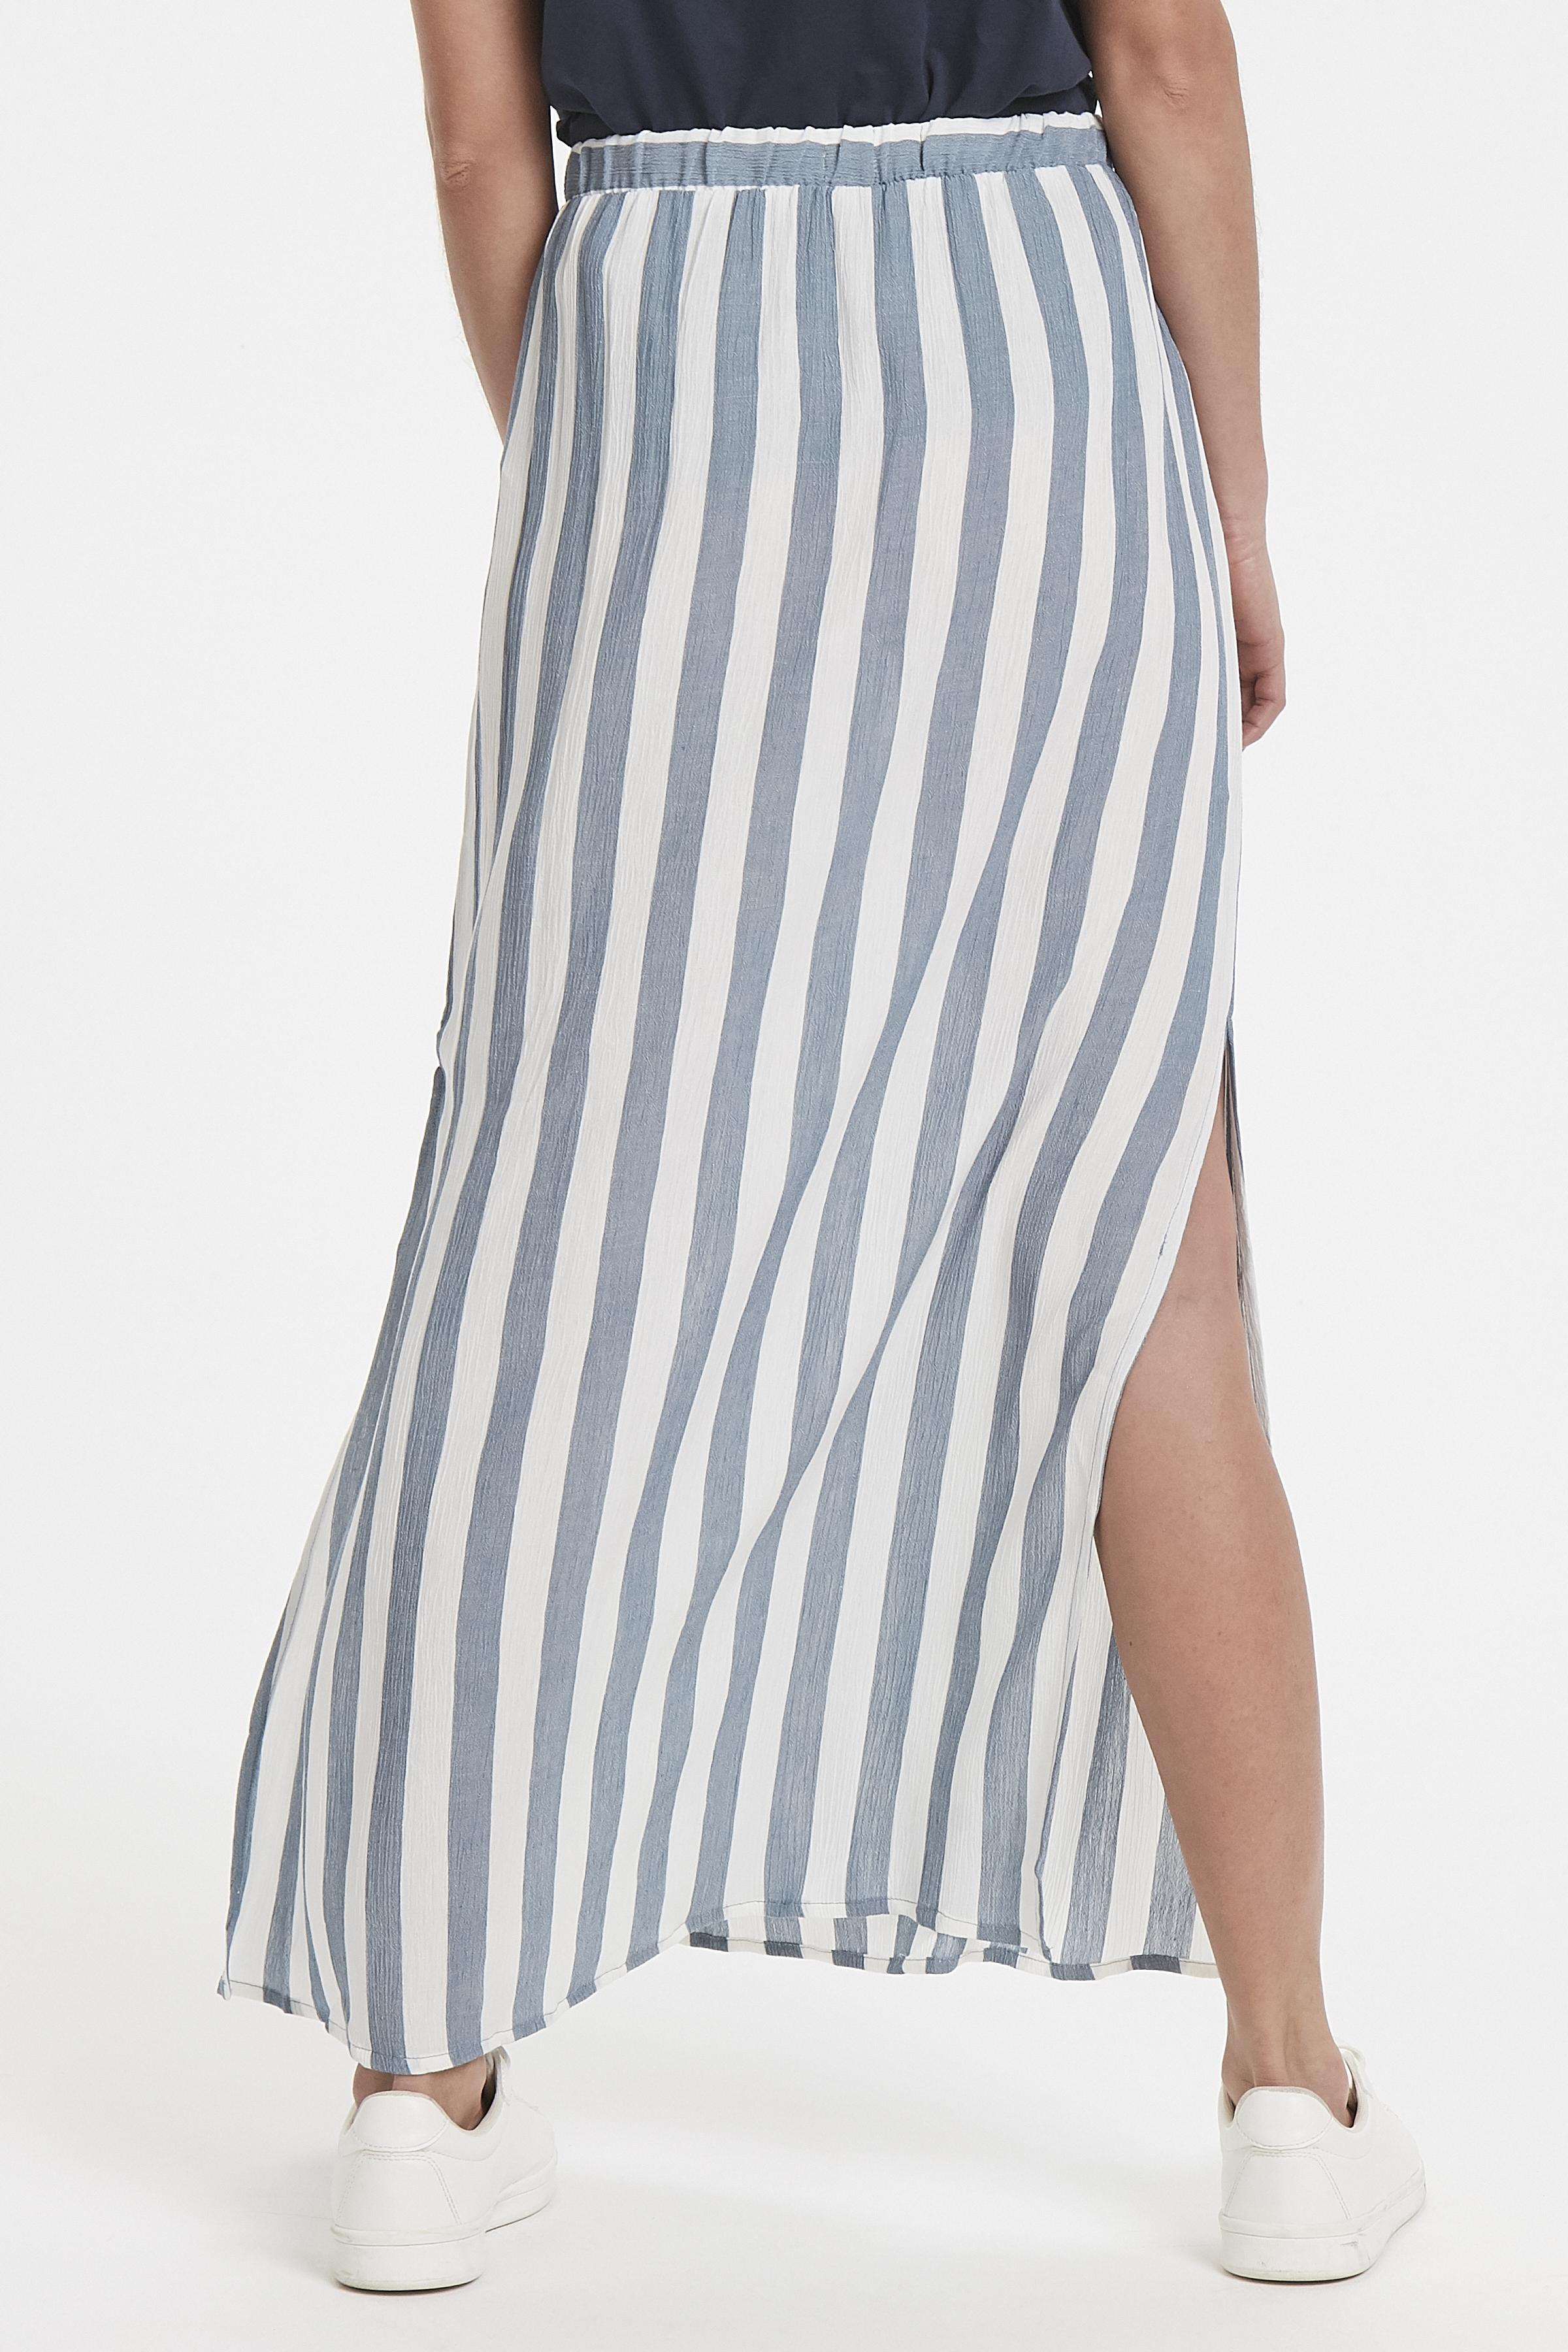 Blue Mirage Skirt fra Ichi – Køb Blue Mirage Skirt fra str. XS-XL her